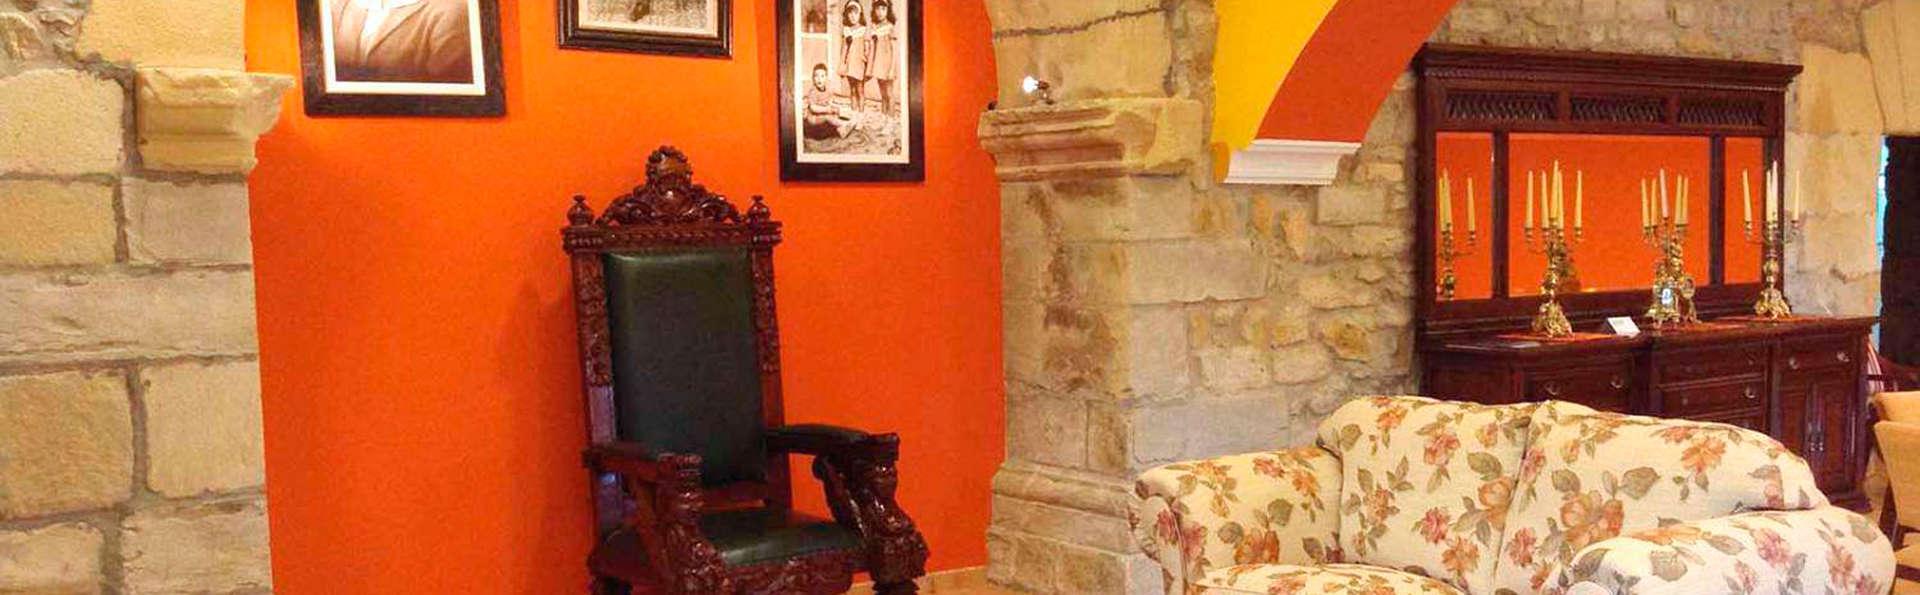 Hotel Casona los Caballeros - EDIT_salon1.jpg